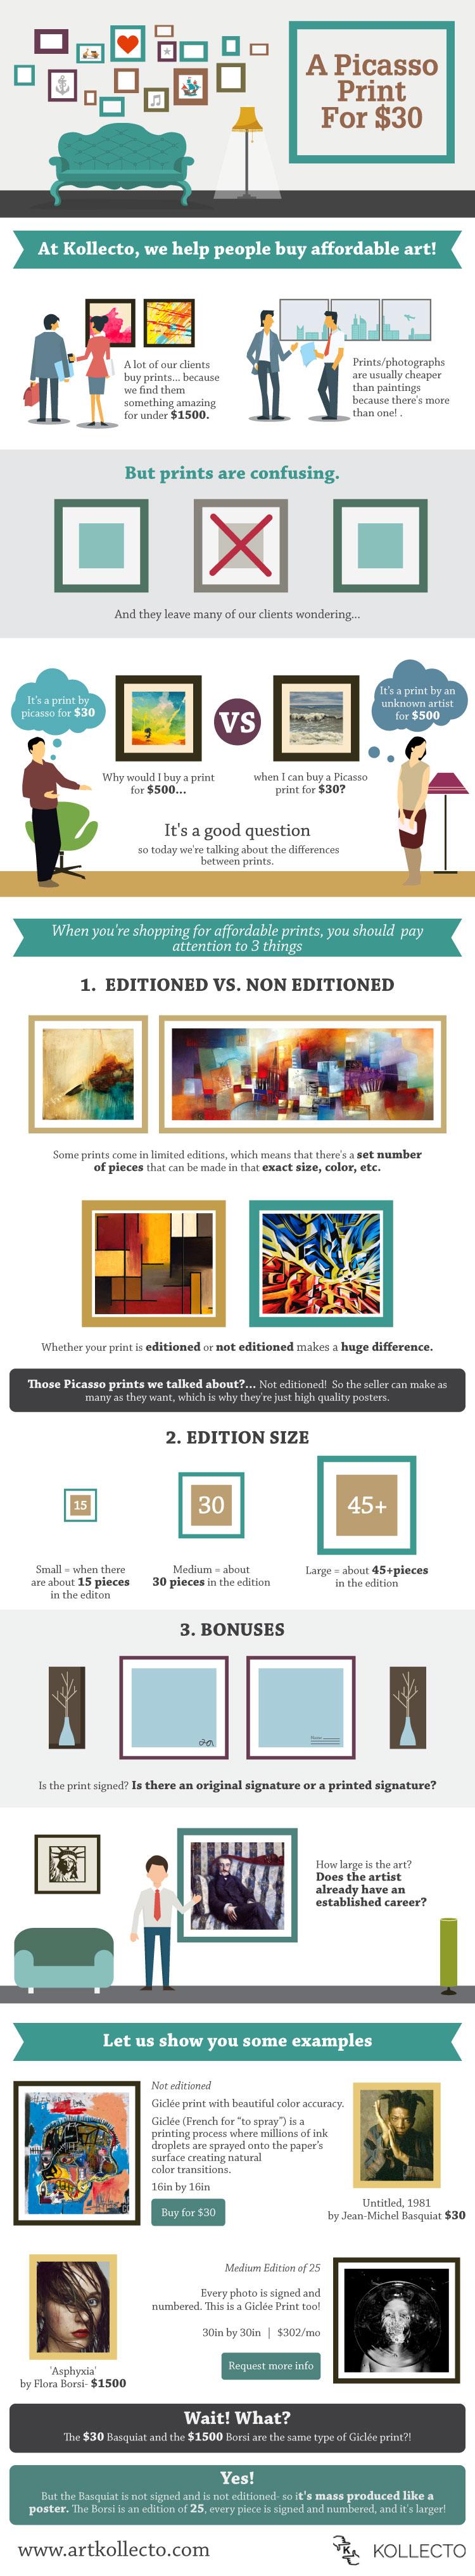 Buying art prints investment soumya dutta e-forex